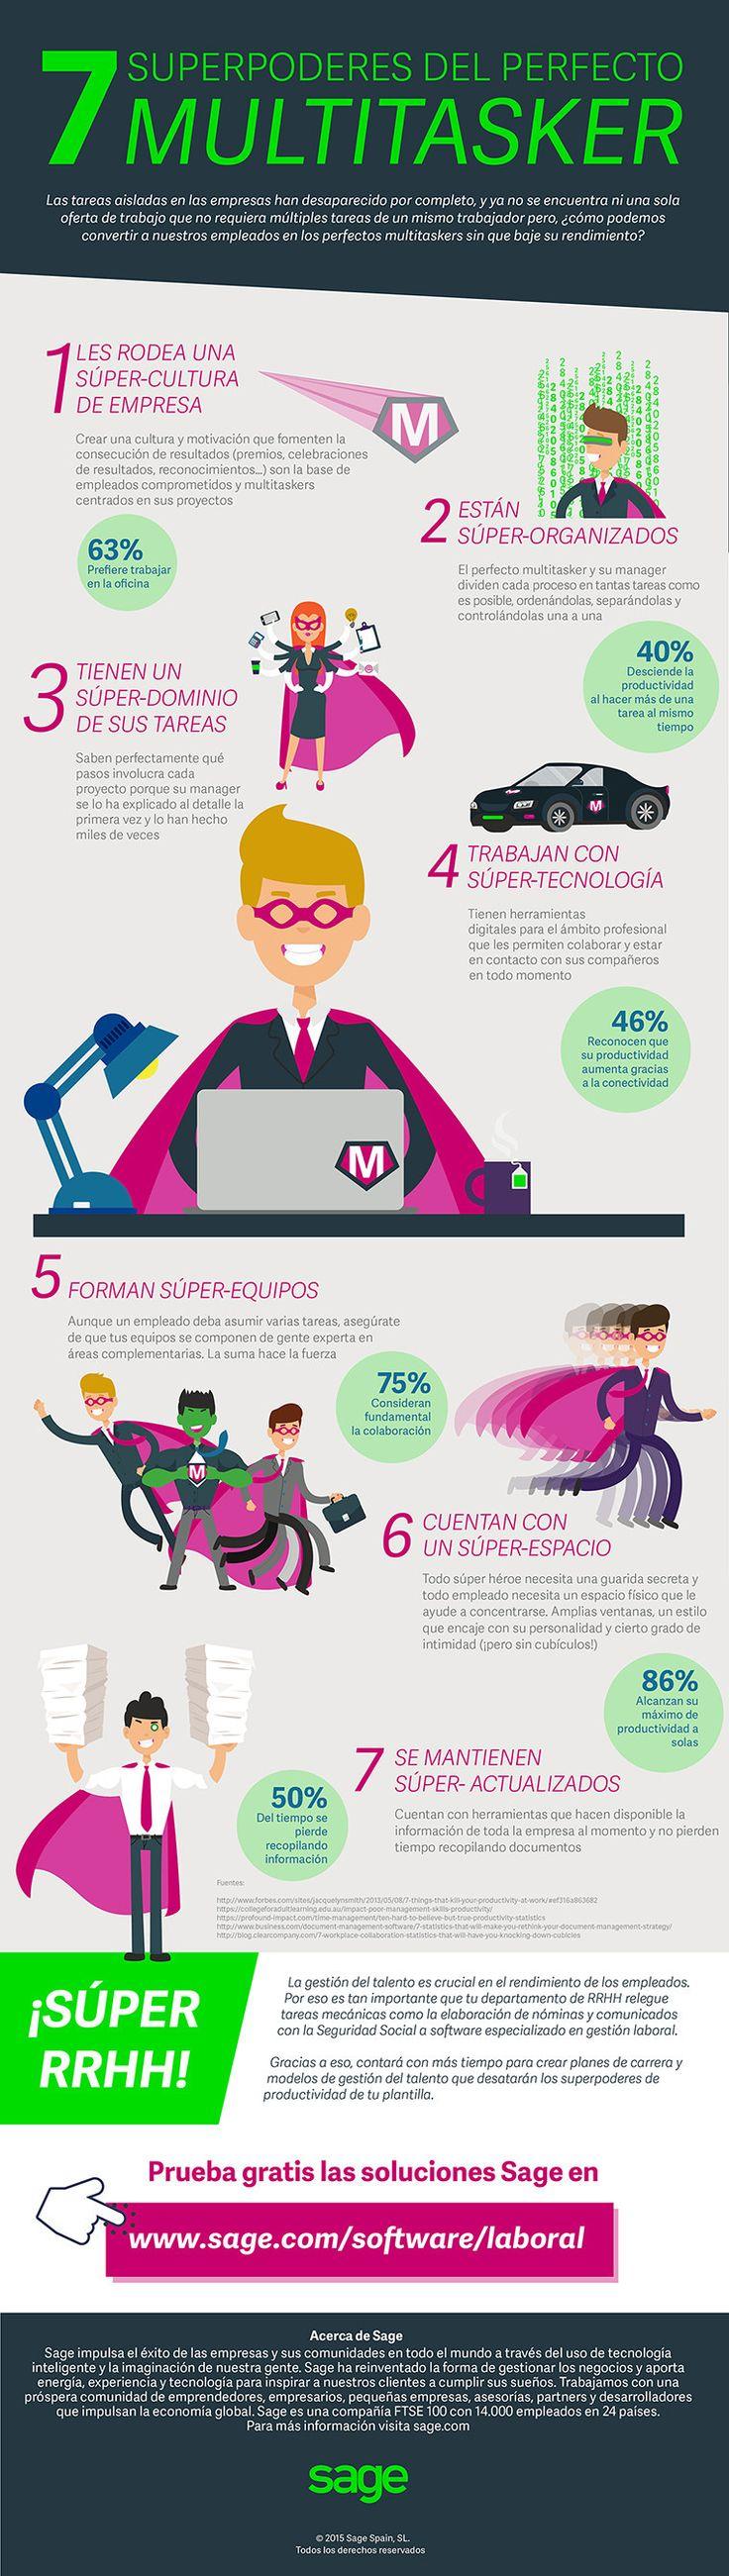 7 superpoderes del perfecto multitasker #infografia